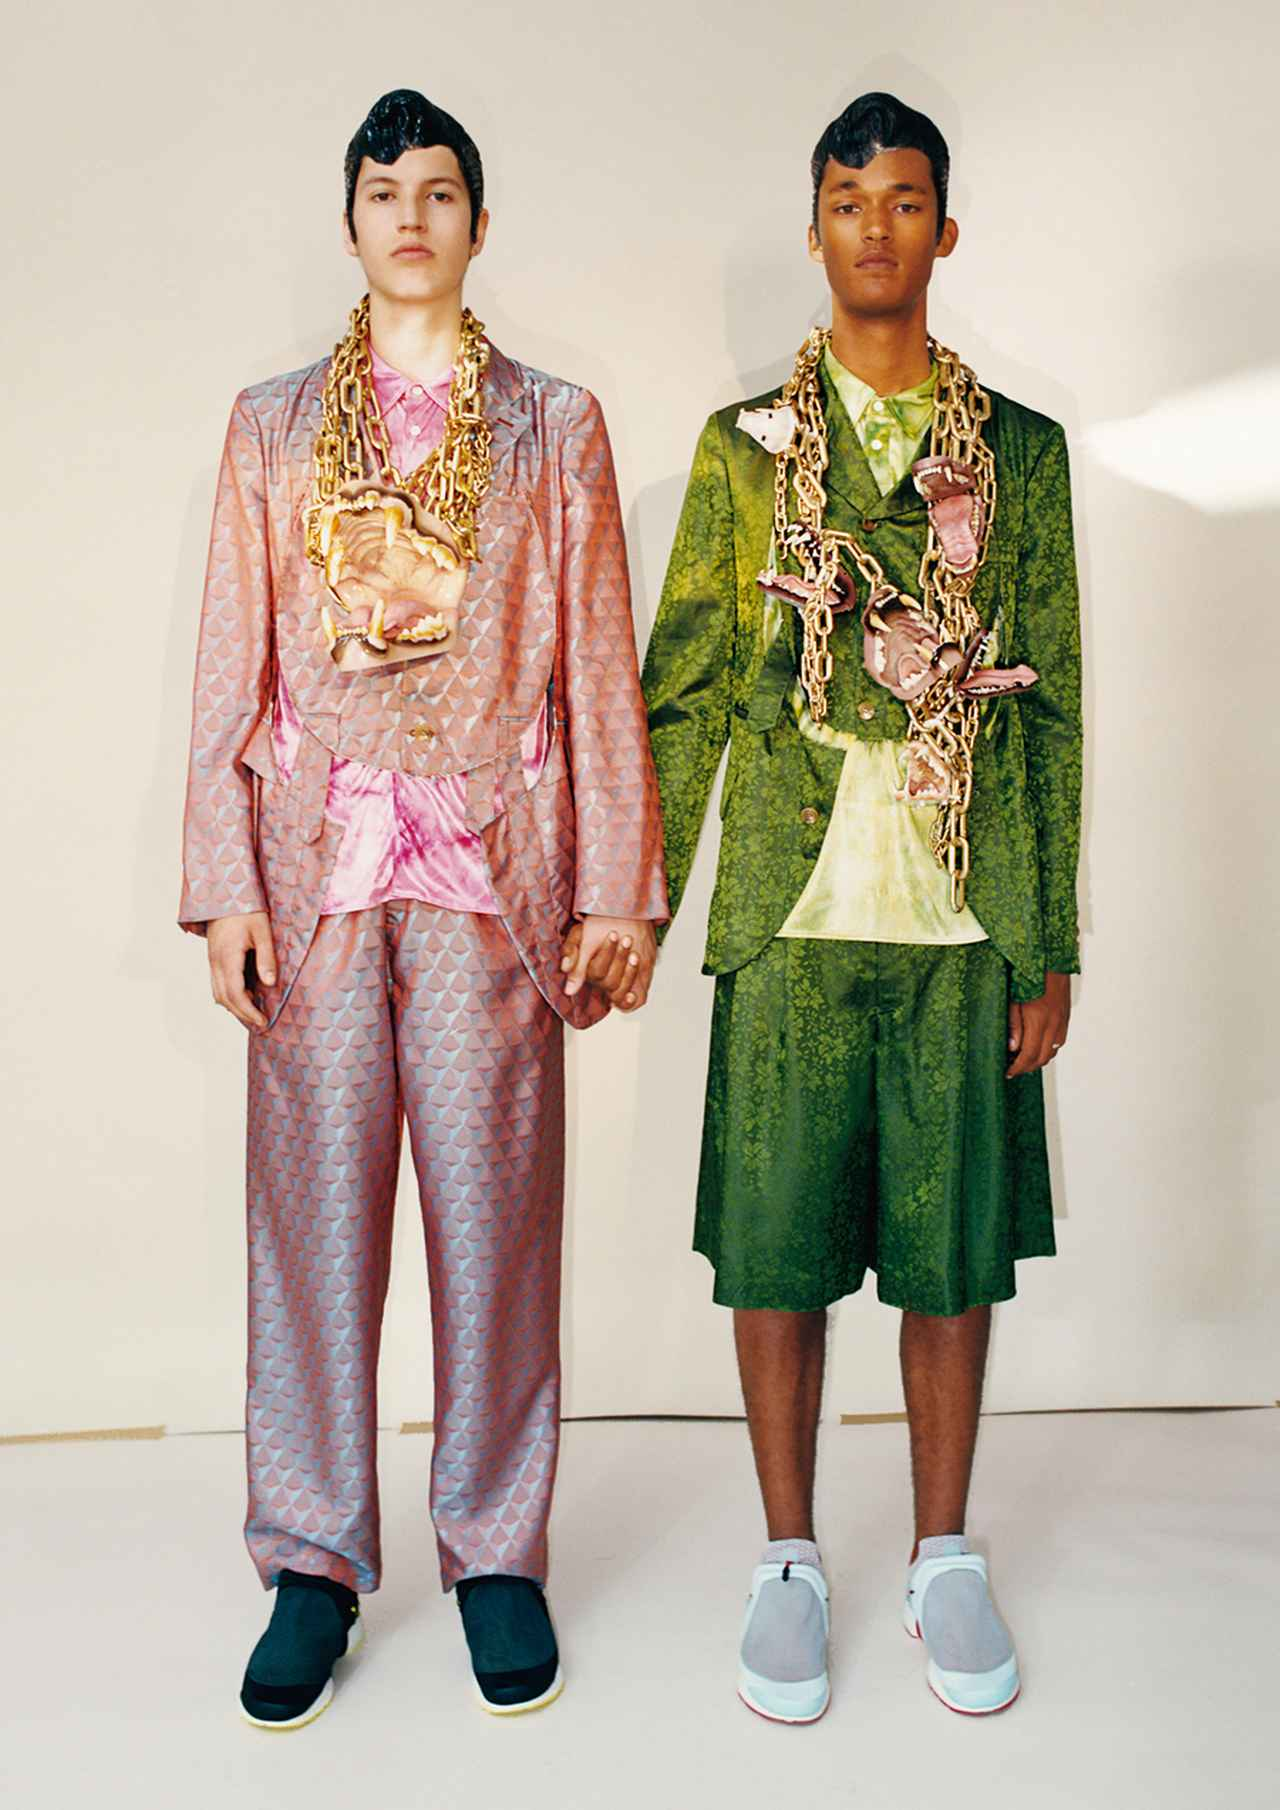 Images : 2番目の画像 - 「川久保 玲ーー ファッションの偉大なる解放者」のアルバム - T JAPAN:The New York Times Style Magazine 公式サイト